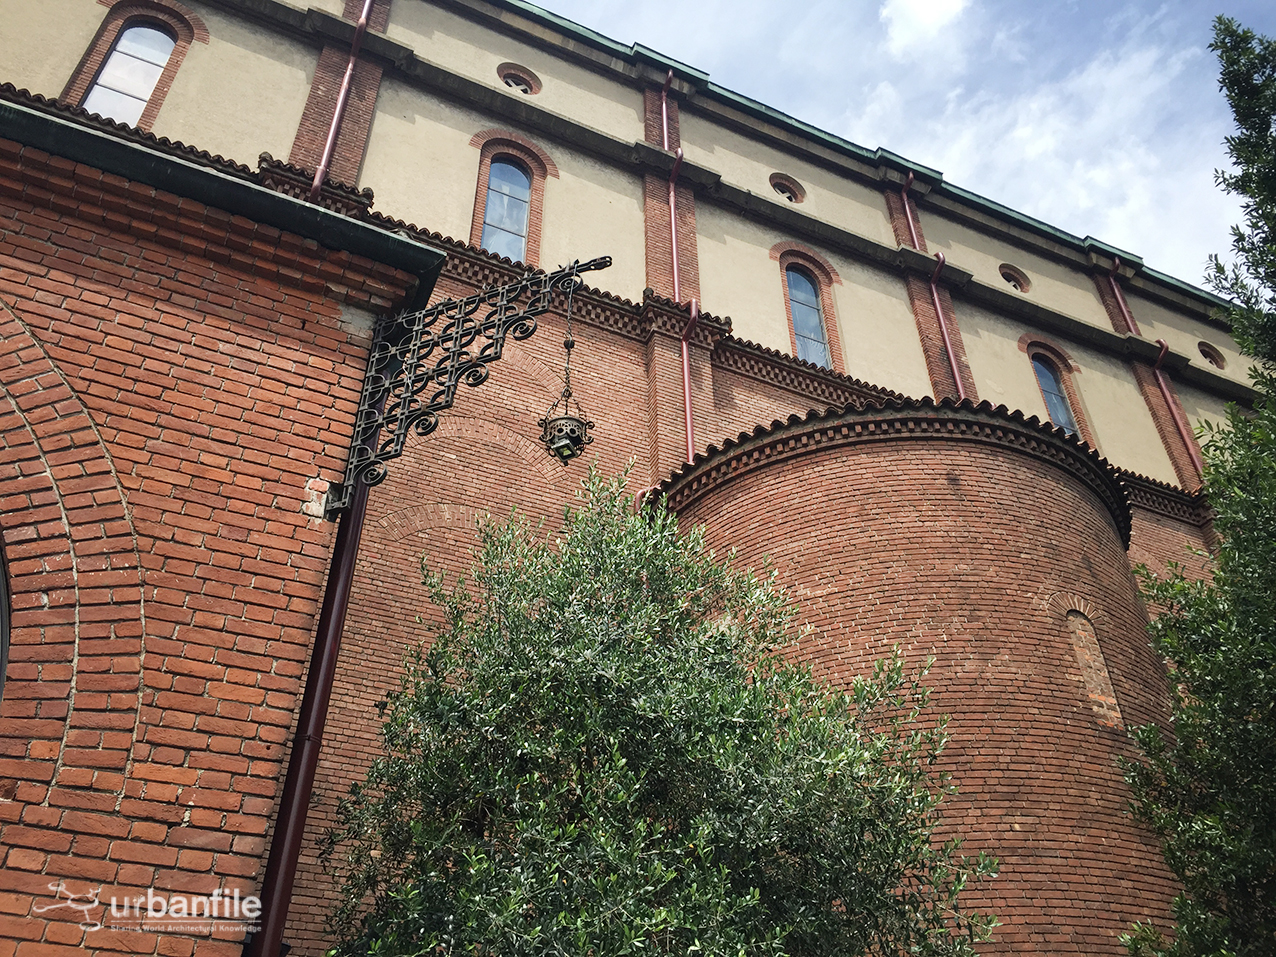 Milano pratocentenaro la nuova san dionigi urbanfile blog - Finestra a tre aperture ...